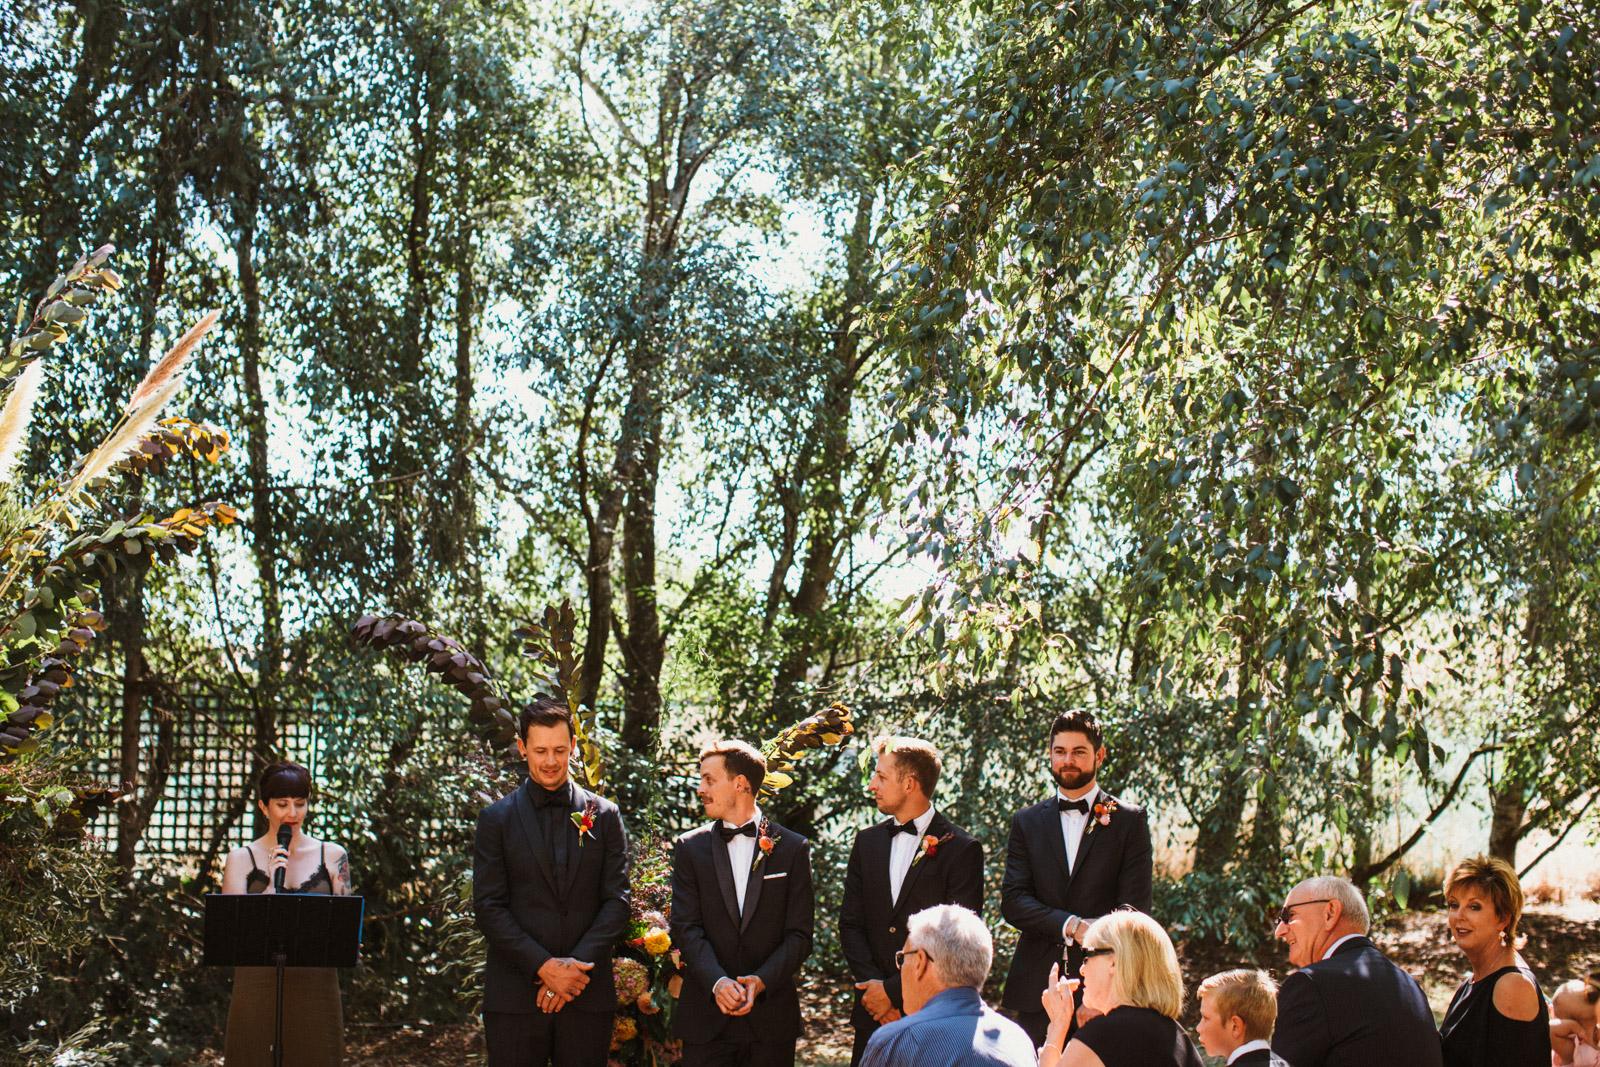 ZD-Melbourne Wedding Photographer-Dean Raphael-39.jpg